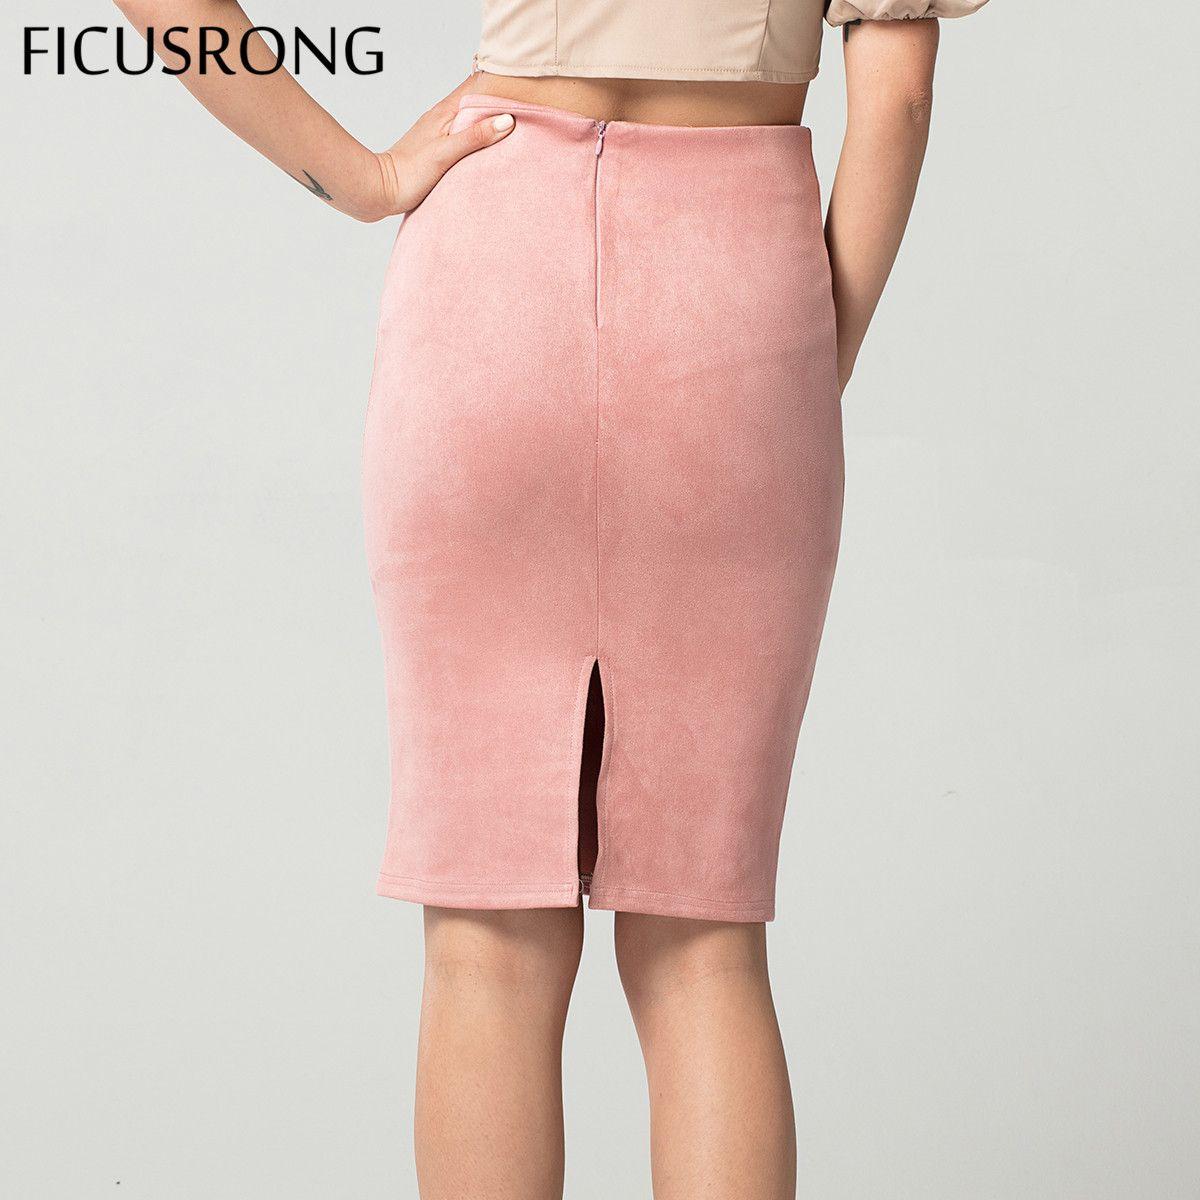 038813ffbfa394 FICUSRONG New Women Skirts Suede Solid Pencil Skirt Female Autumn Winter High  Waist Bodycon Vintage Split